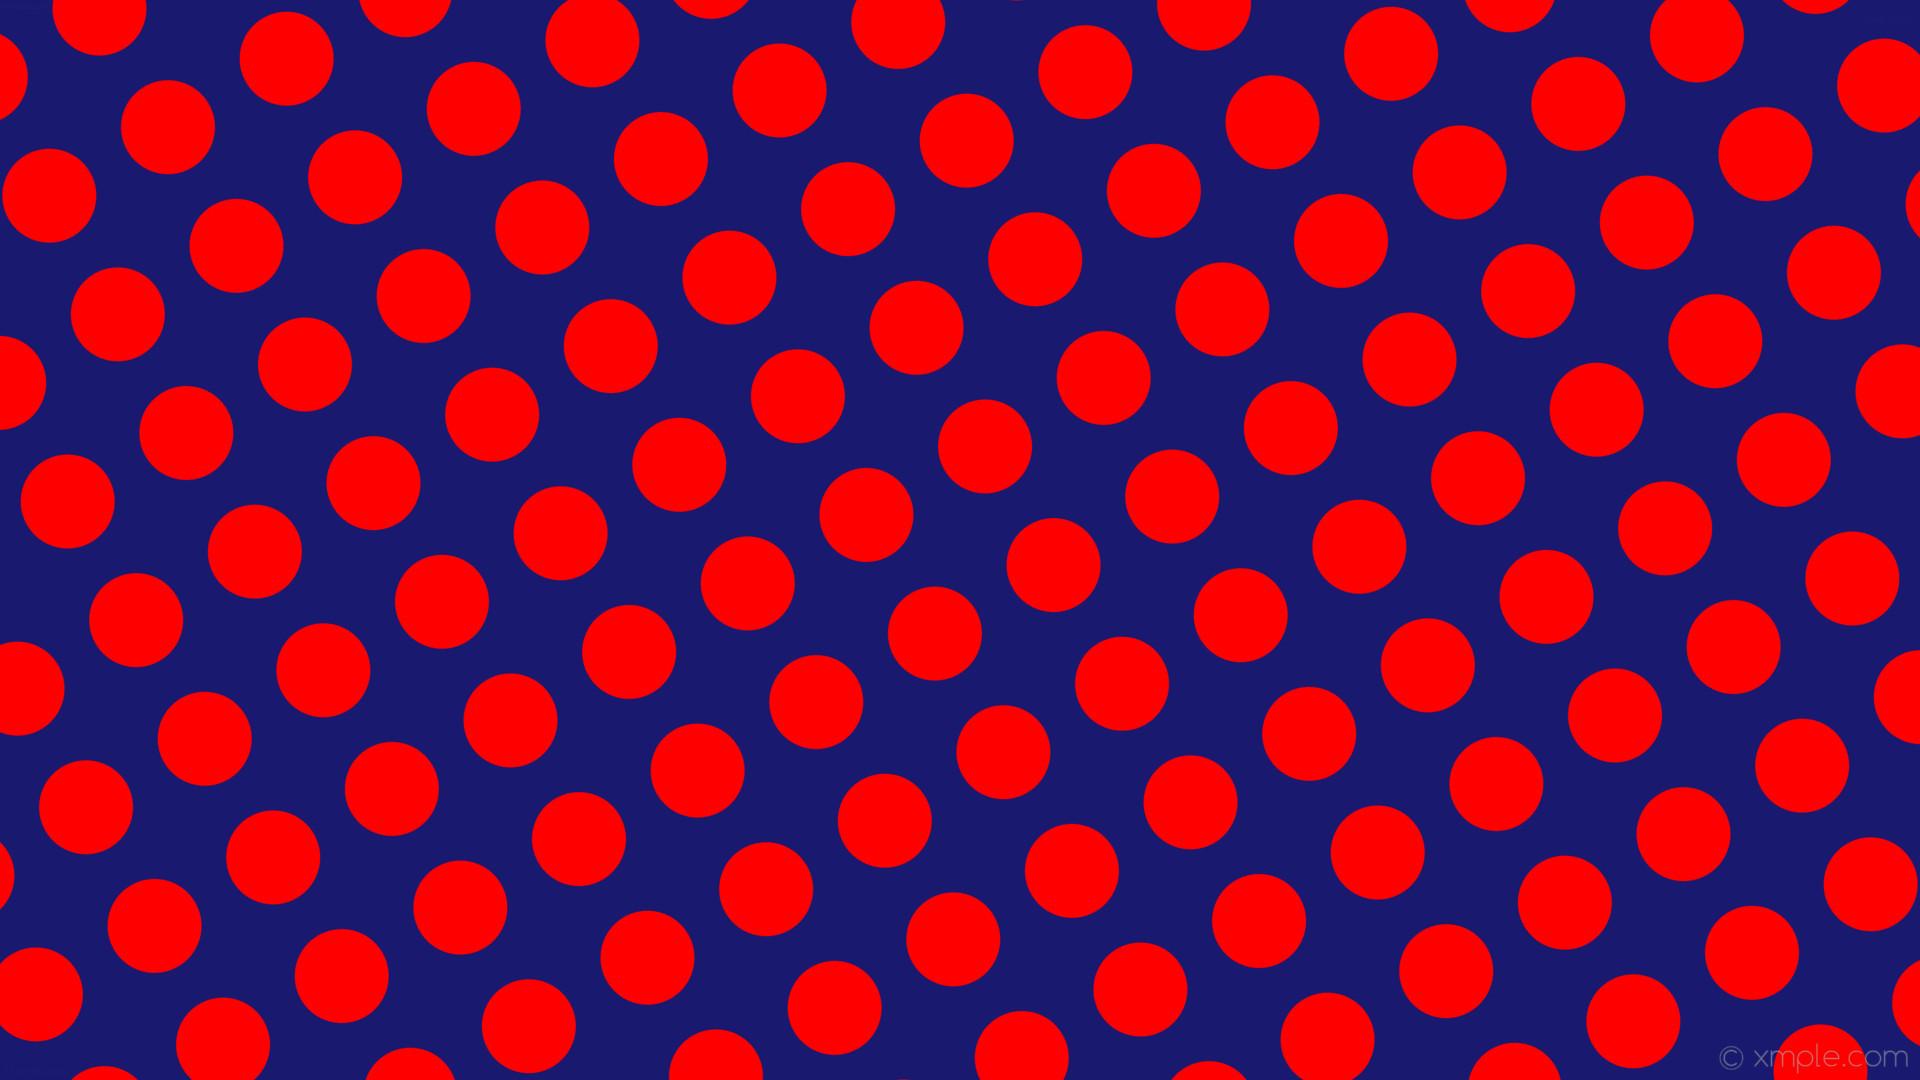 wallpaper polka spots red dots blue midnight blue #191970 #ff0000 210° 94px  137px